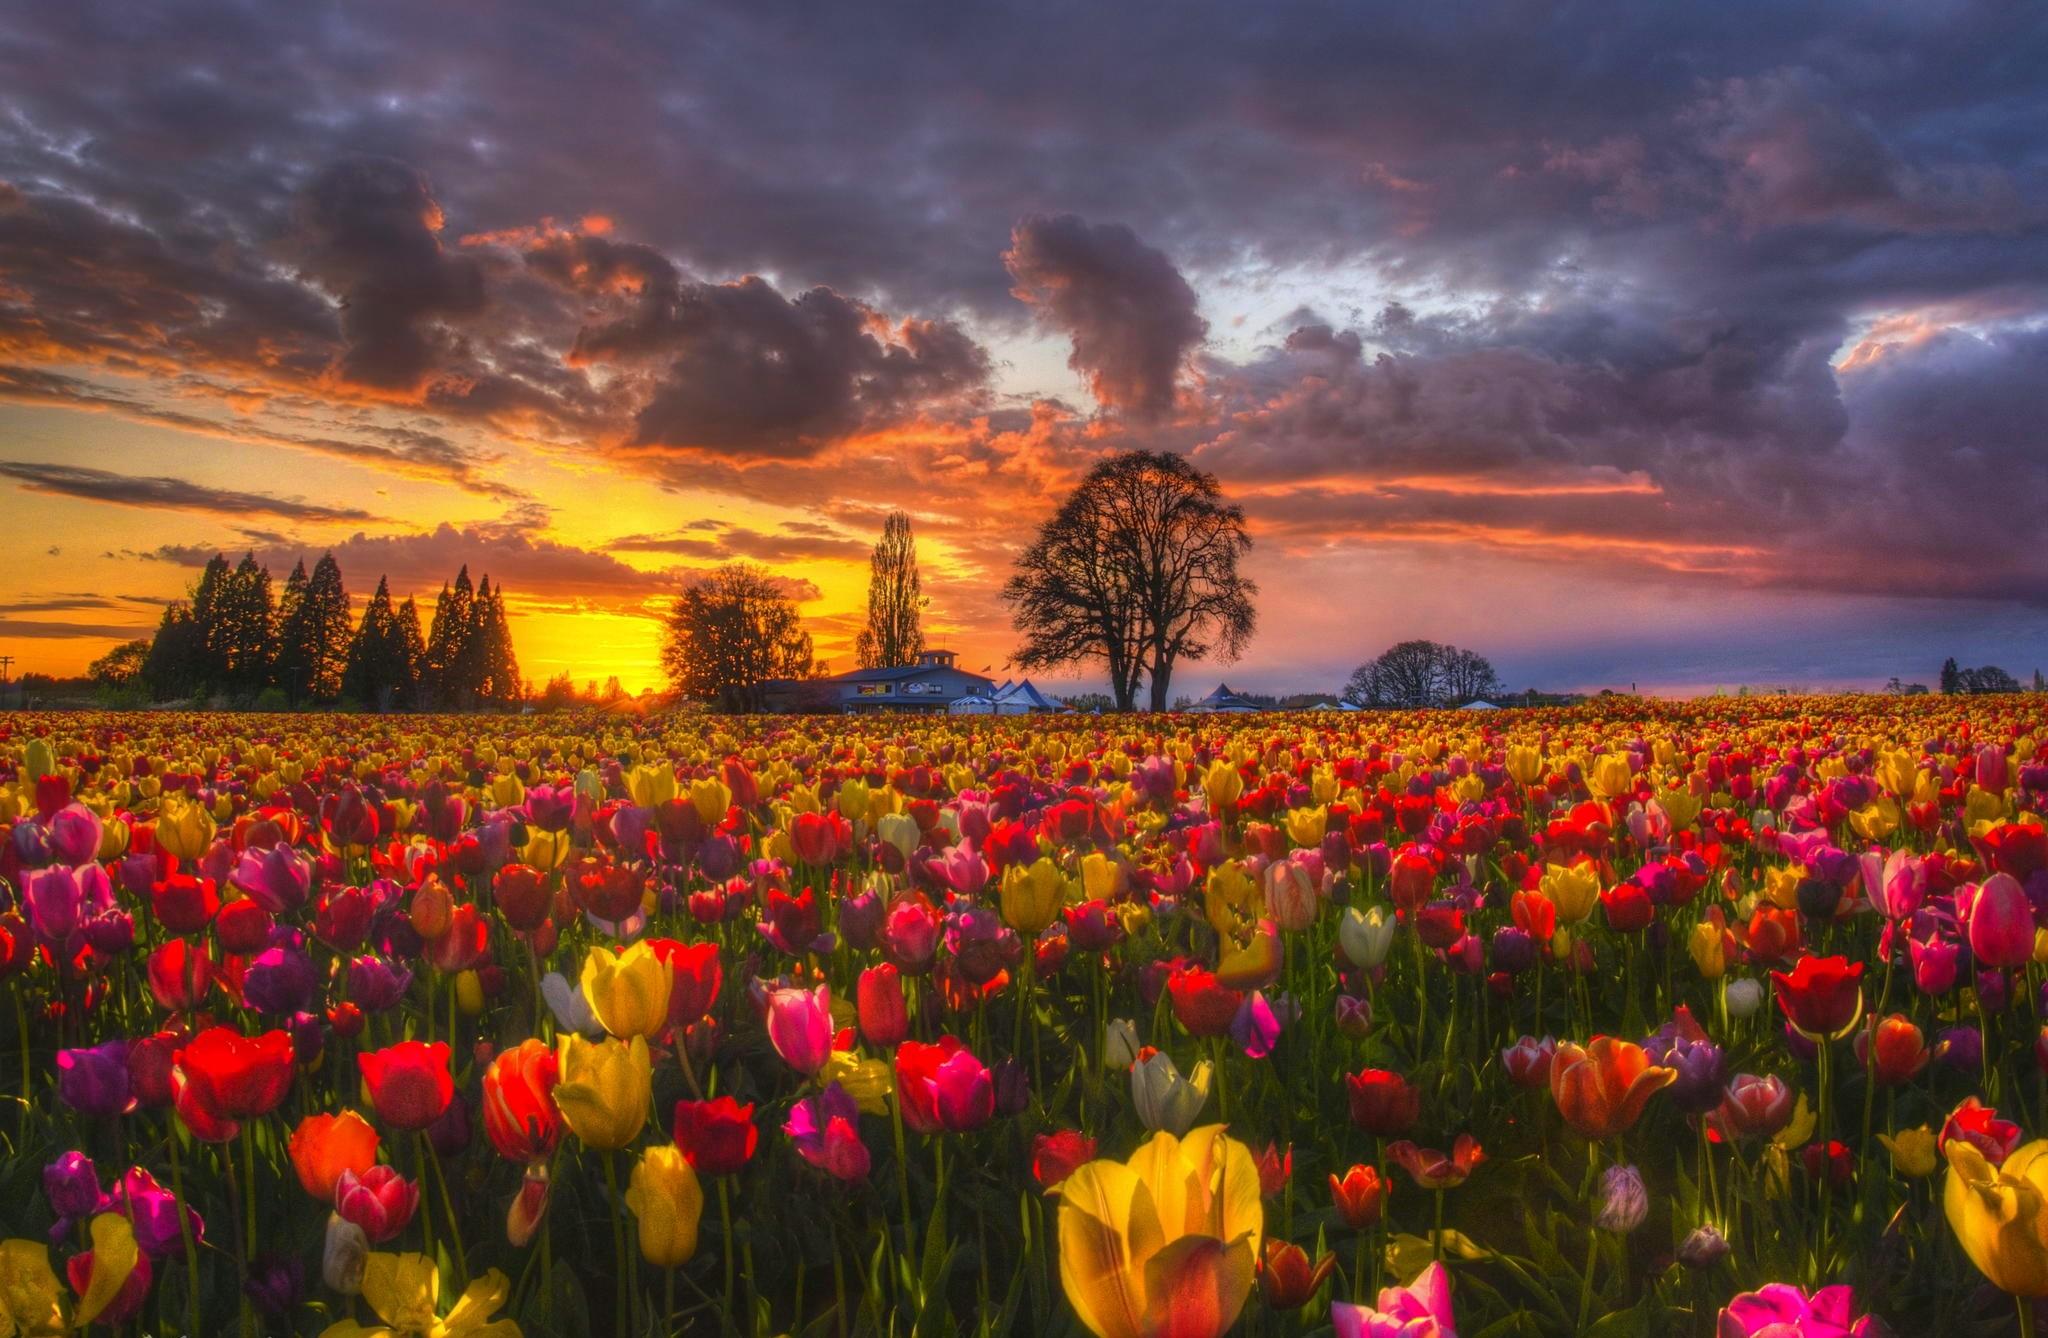 Spring Flowers Tulips Field Sunrise Grass Clouds: Desktop Nexus Lightning Wallpapers